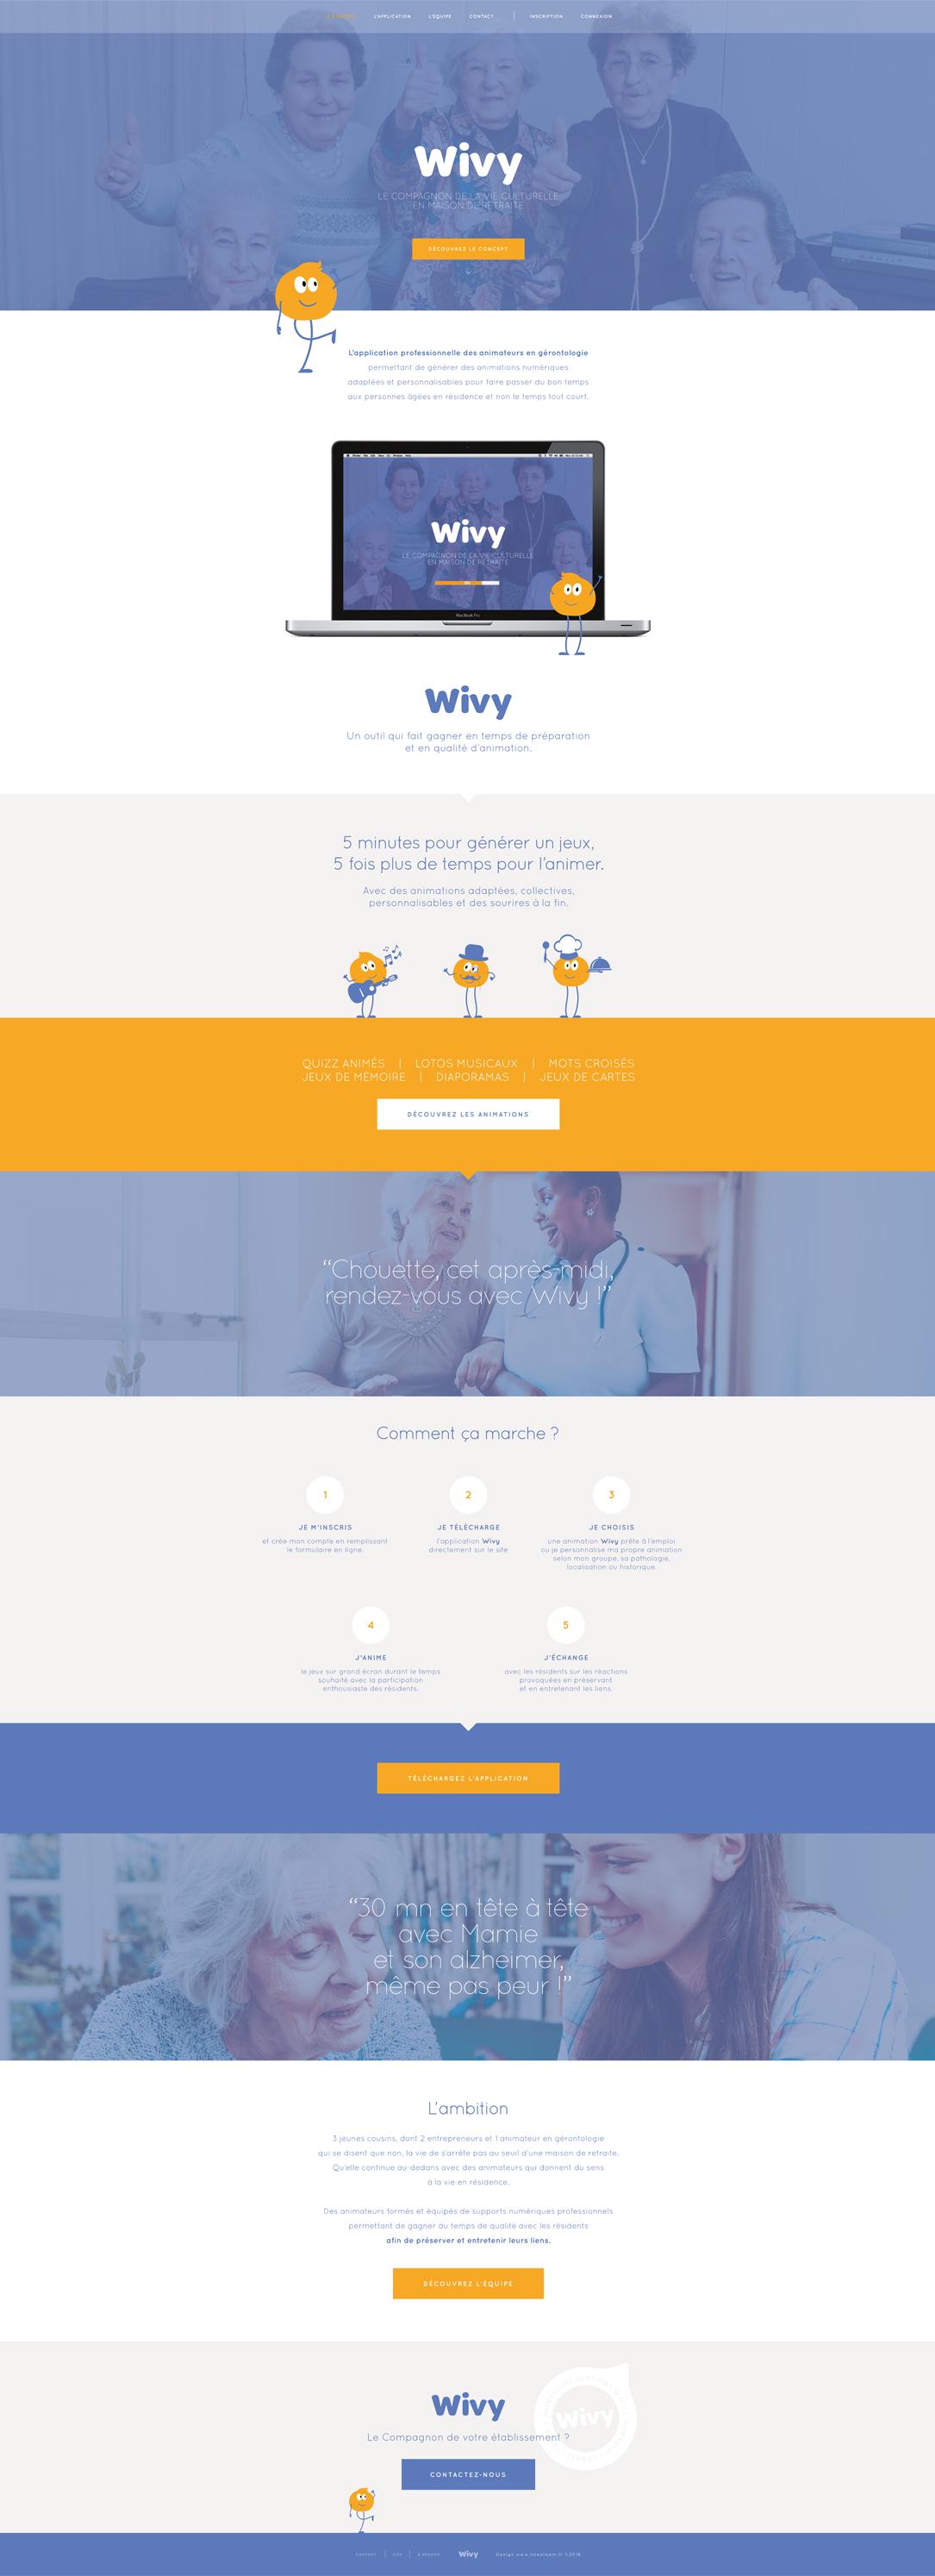 WIVY - Web design